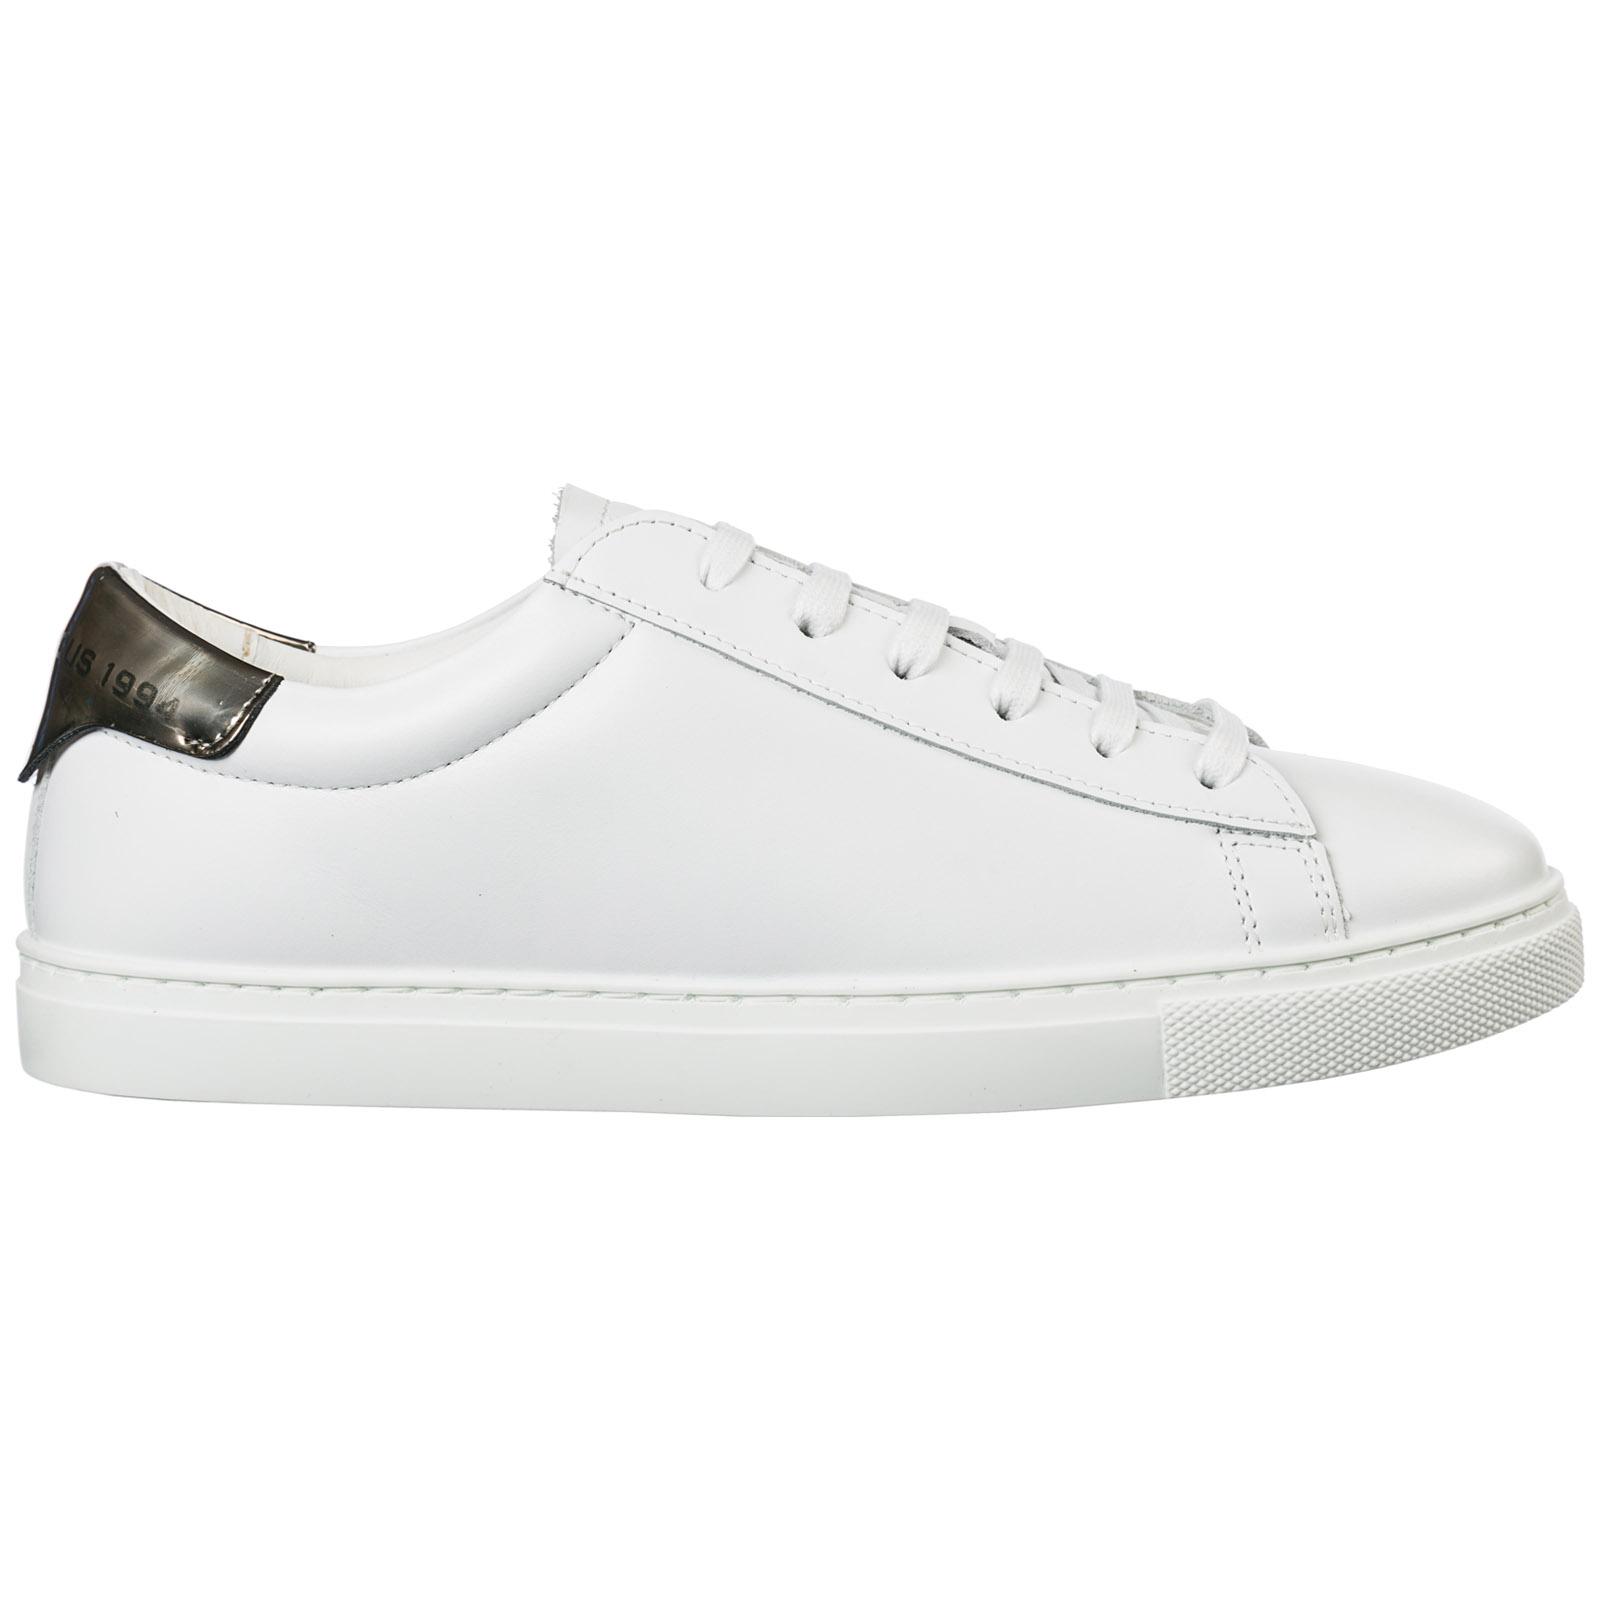 Sneakers Dsquared2 Mert \u0026 Marcus